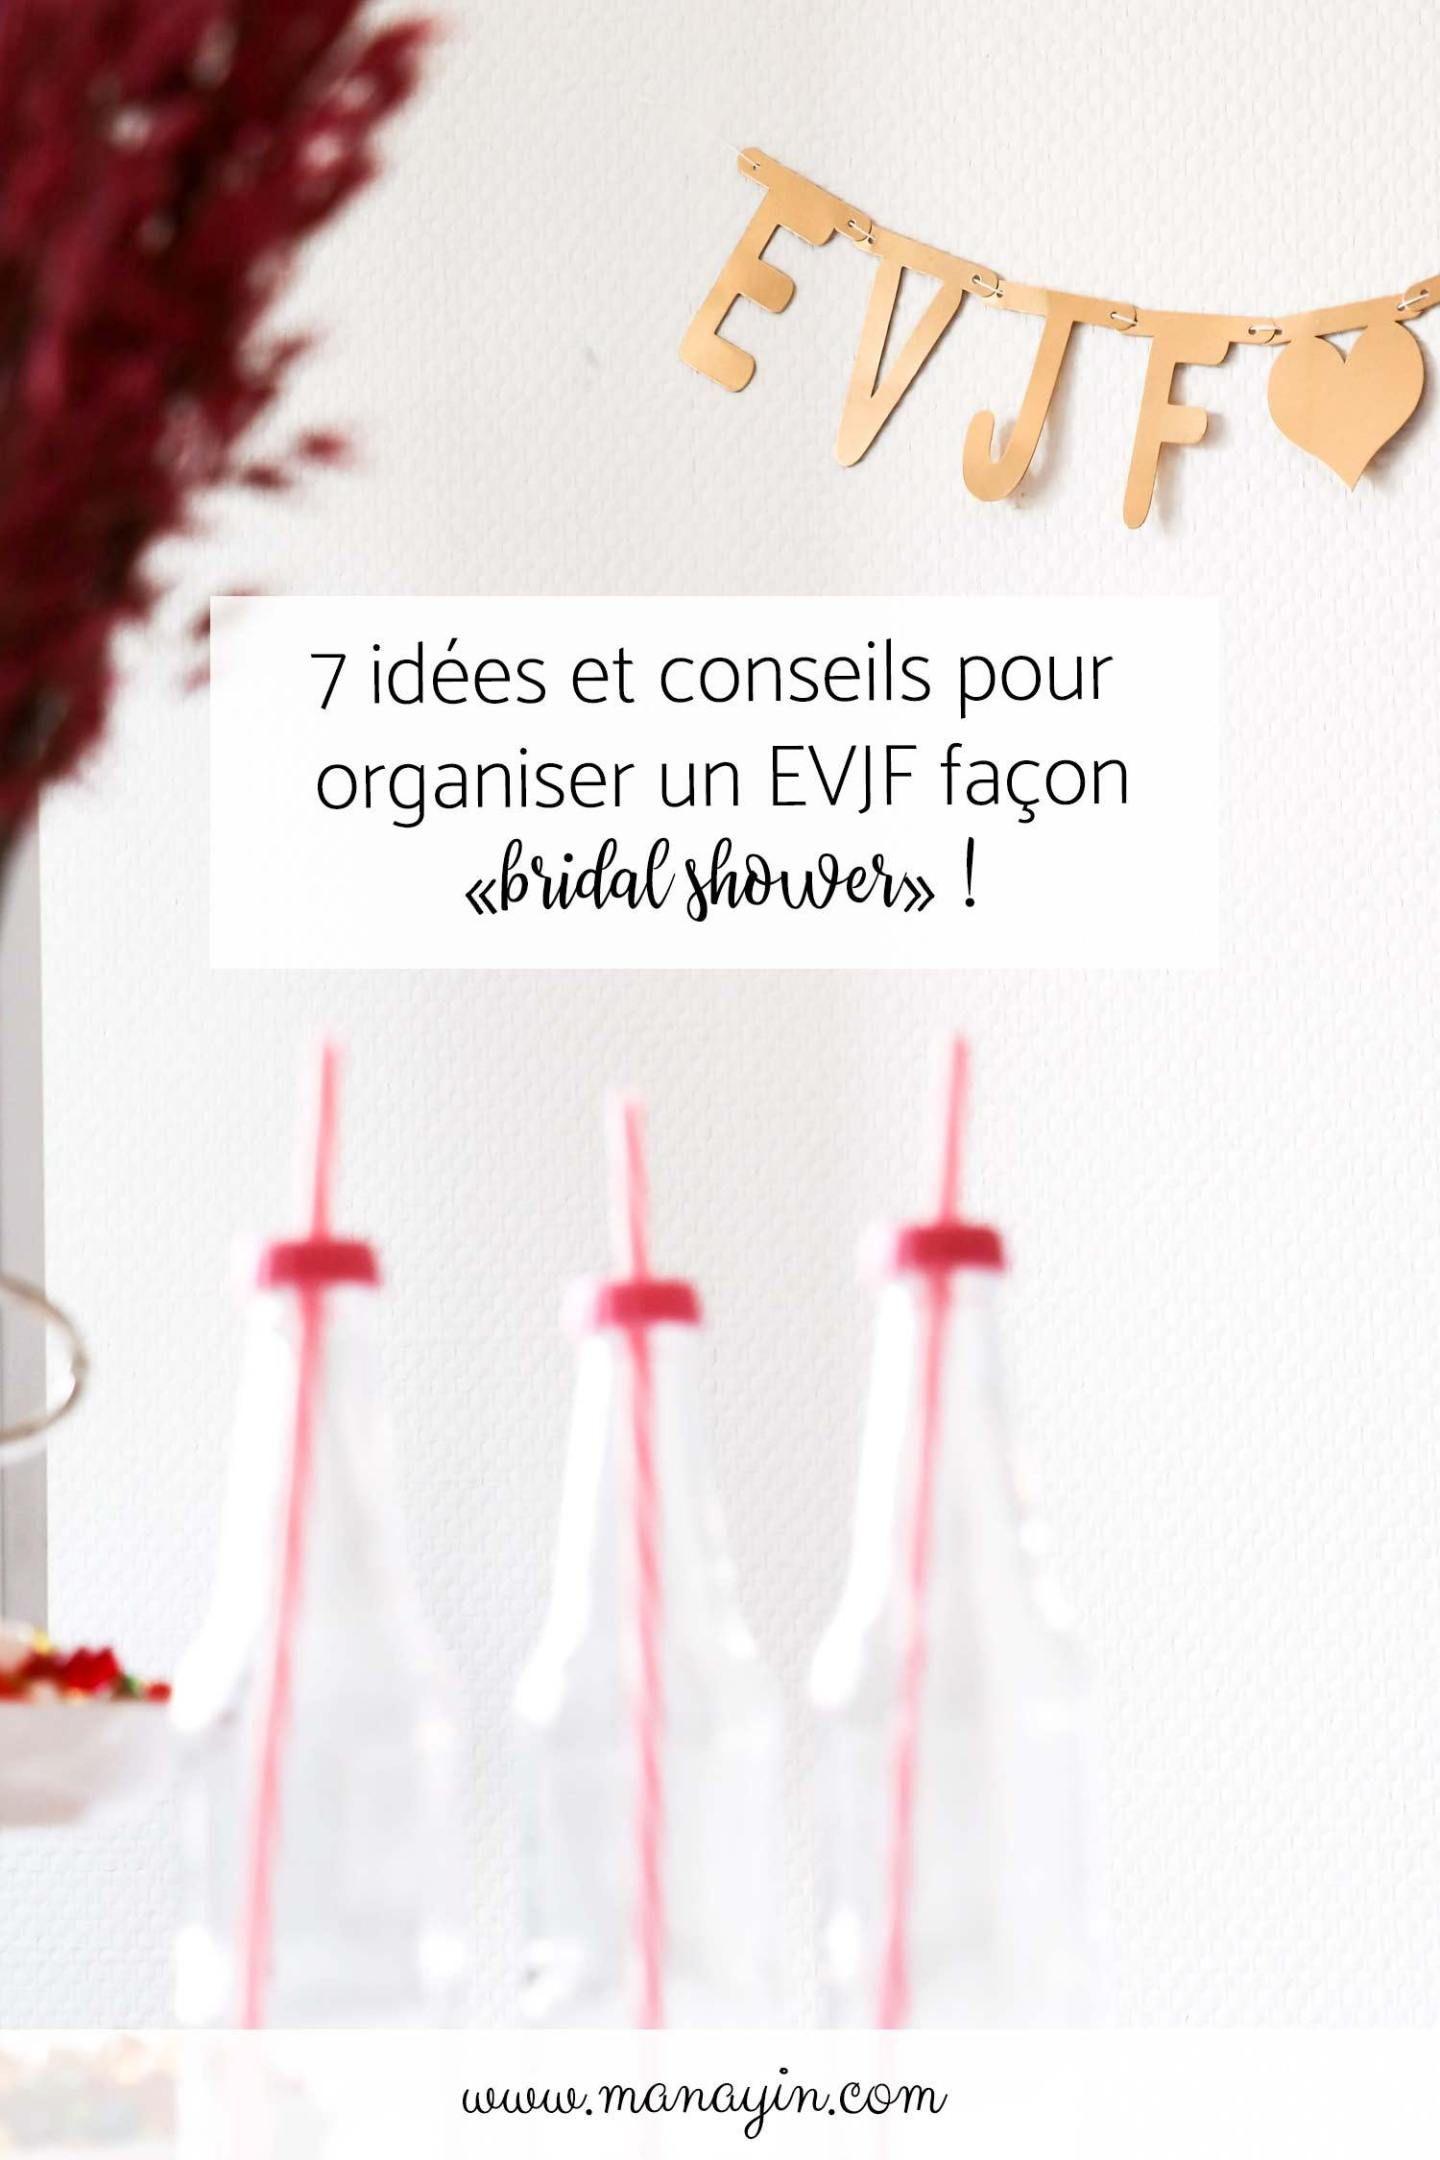 7 Idees Et Conseils Pour Un Evjf Facon Bridal Shower Manayin Idee Mariage Temoin Idee Evjf Cadeau Pour Maries